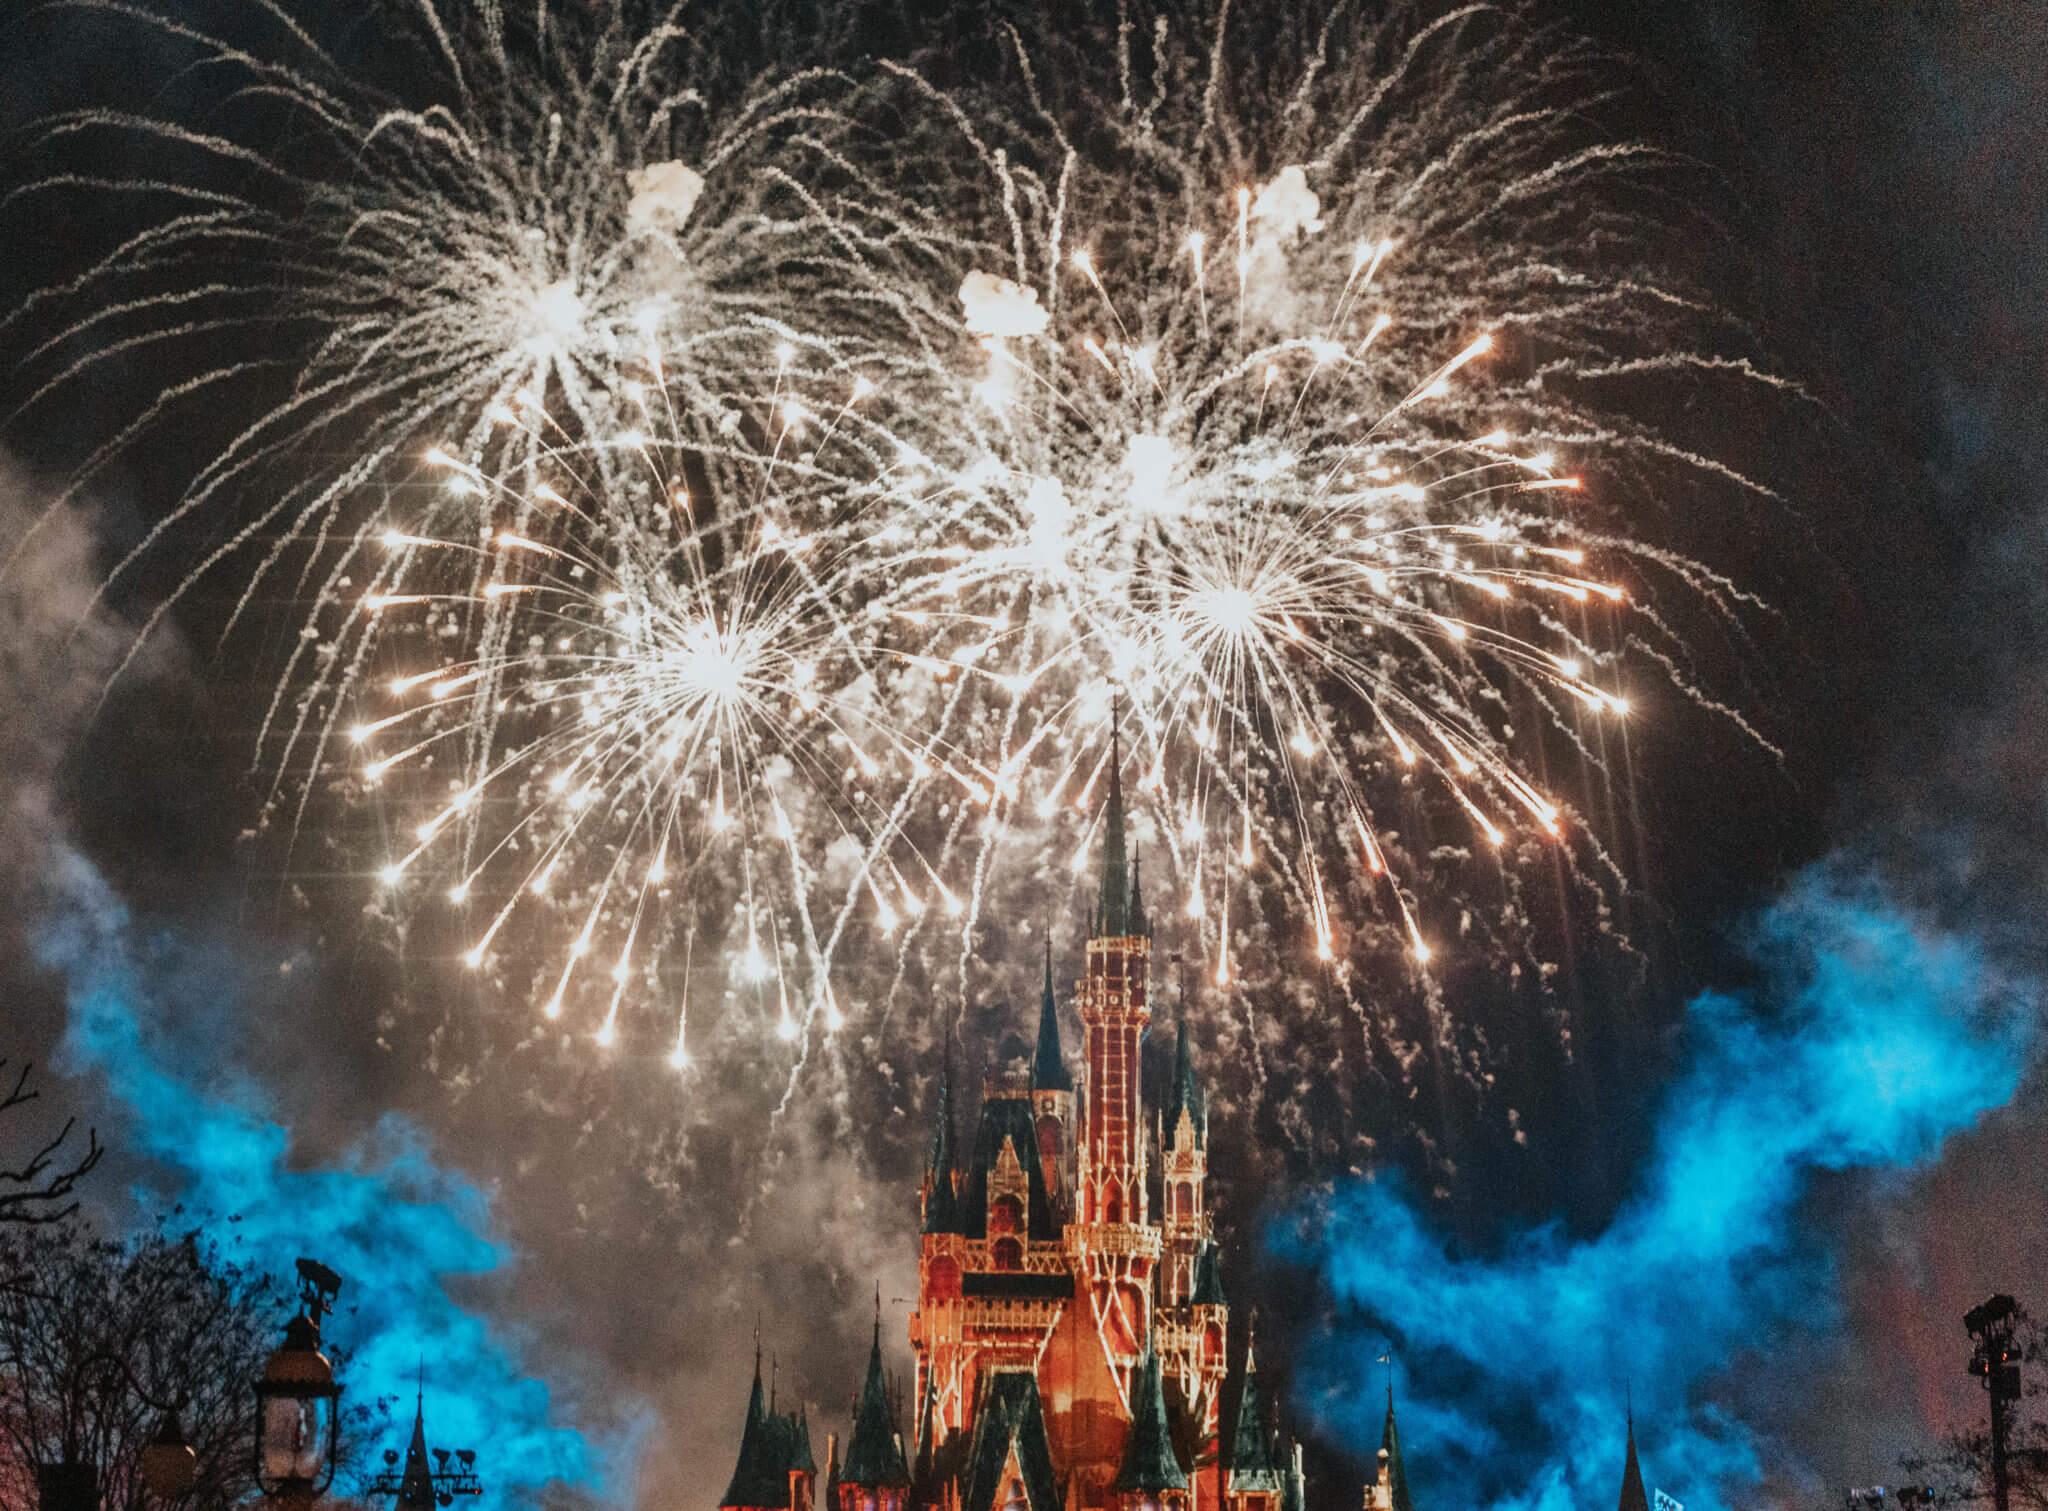 Cinderella Castle Happily Ever After Fireworks with pink filter